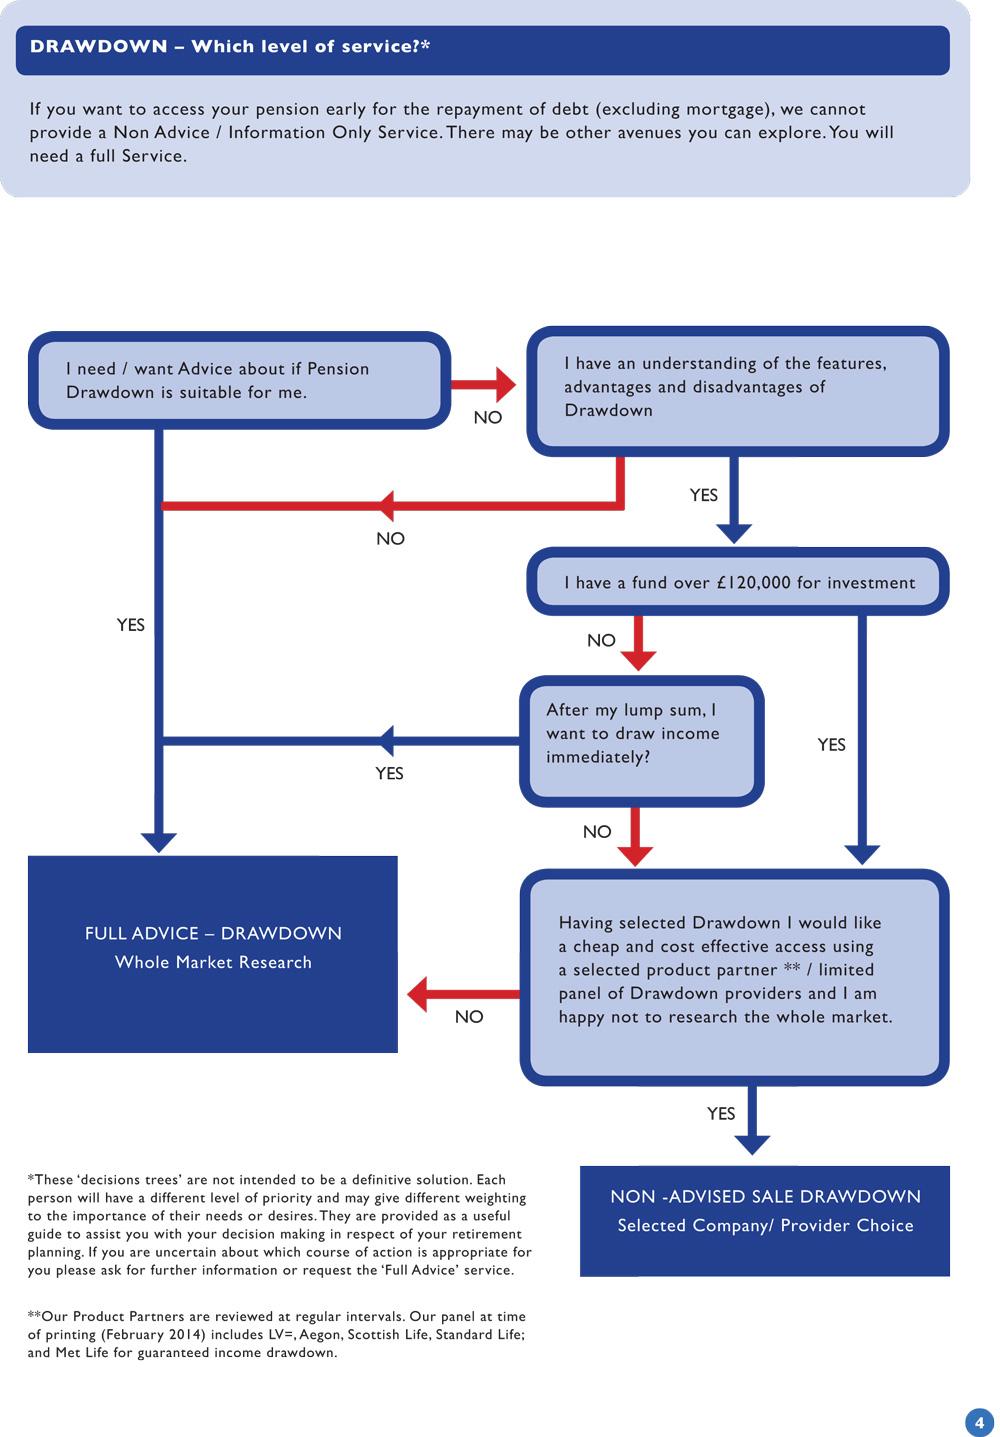 Level of service diagram